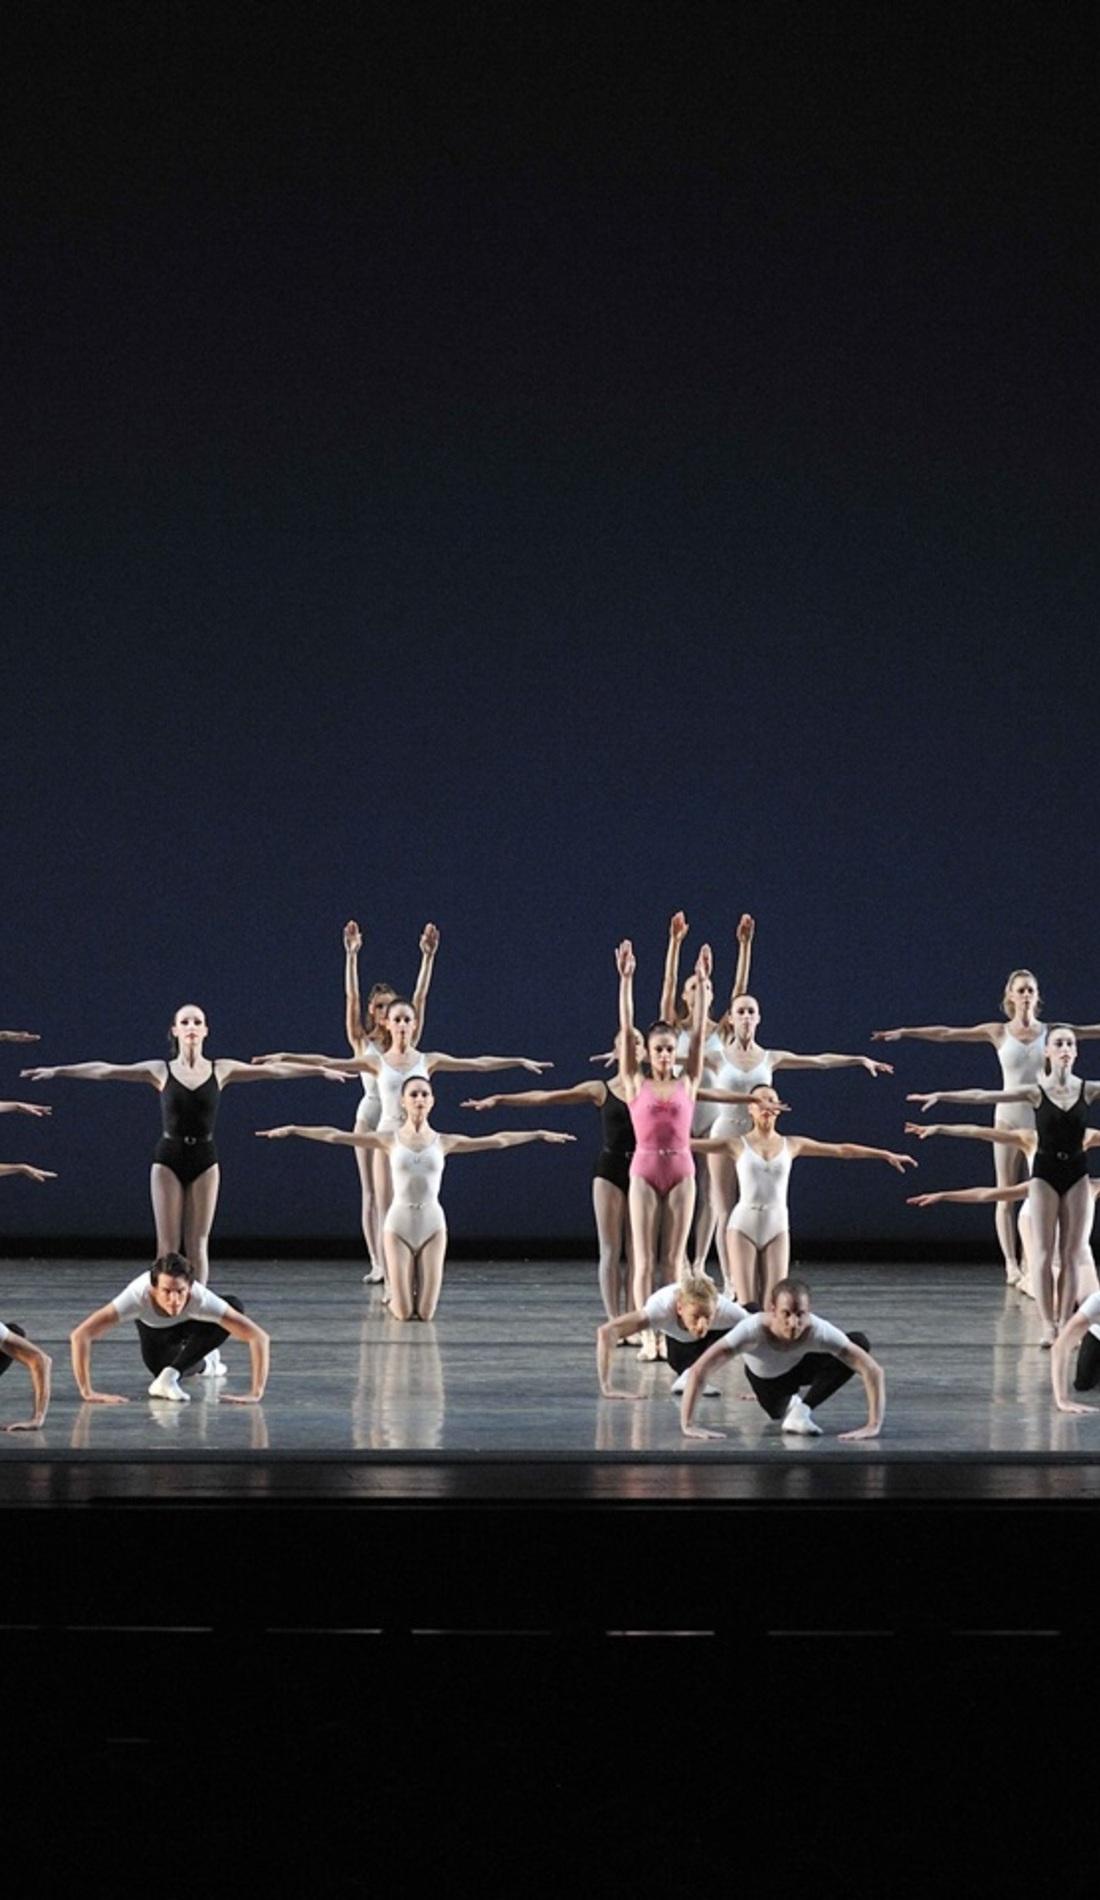 A Miami City Ballet live event